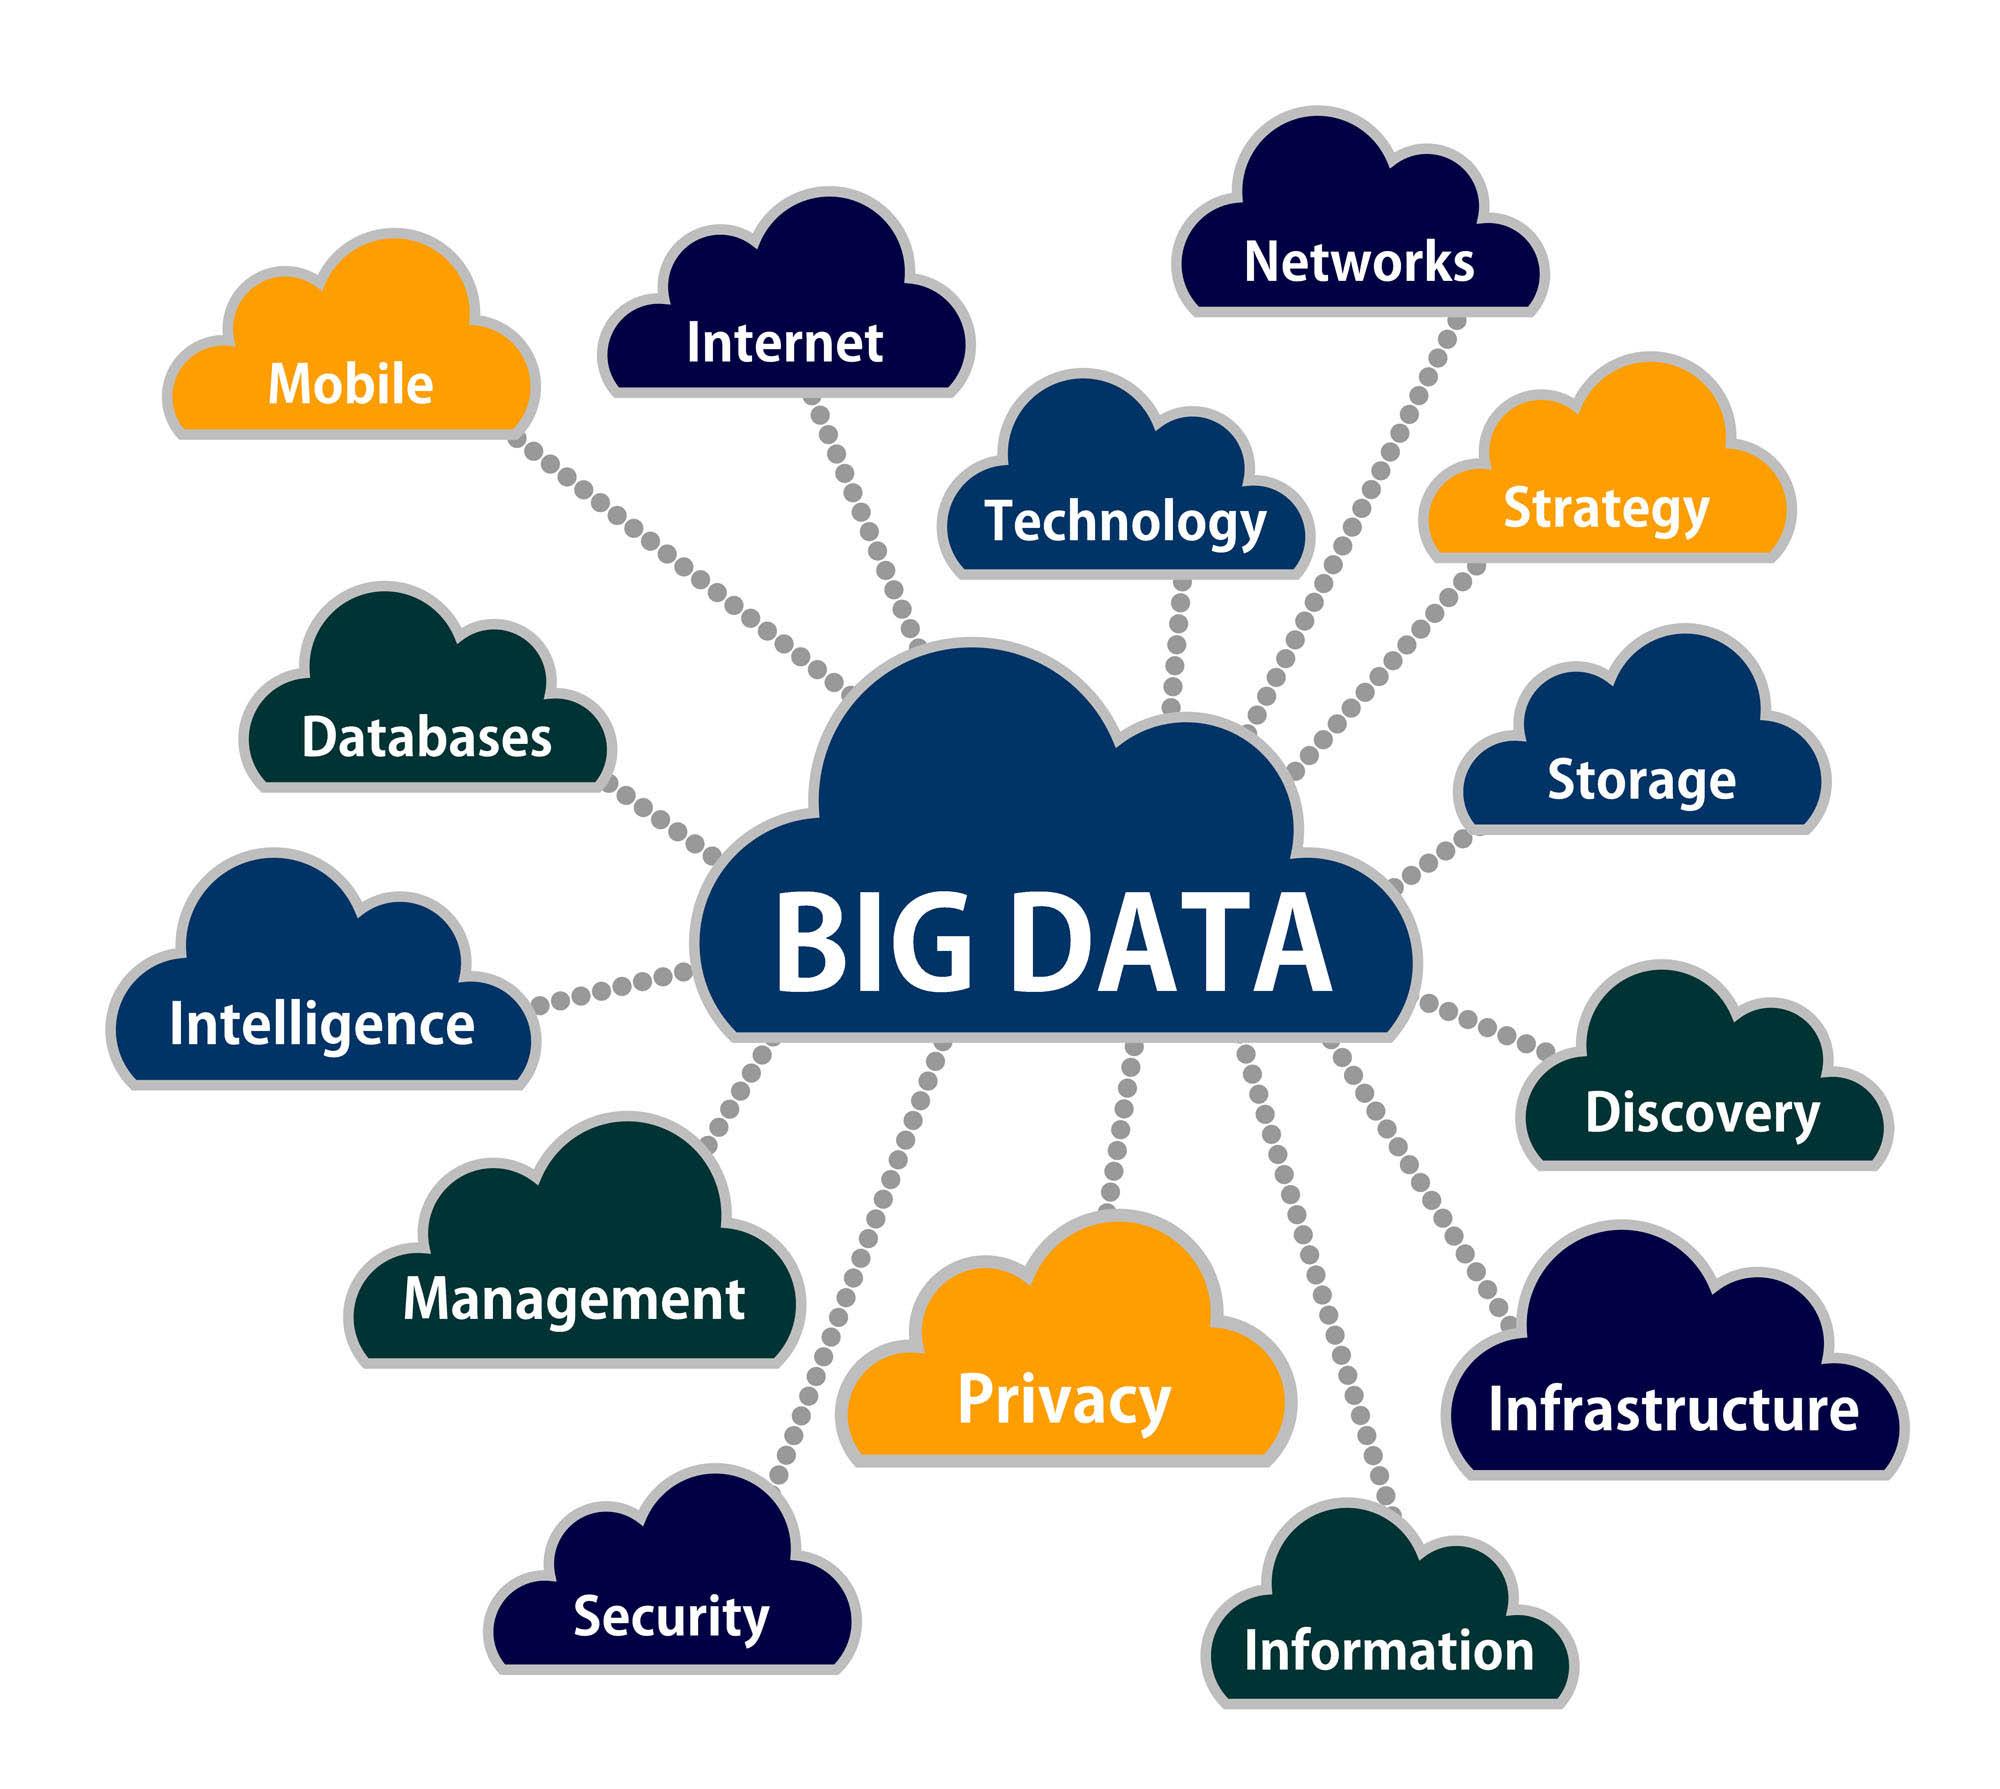 Big Data Services Market: Investors Eye Bigger Than Expected | 10gen Inc., MarkLogic Corp., Microsoft Corp., Dell Inc., Calpont Corp.